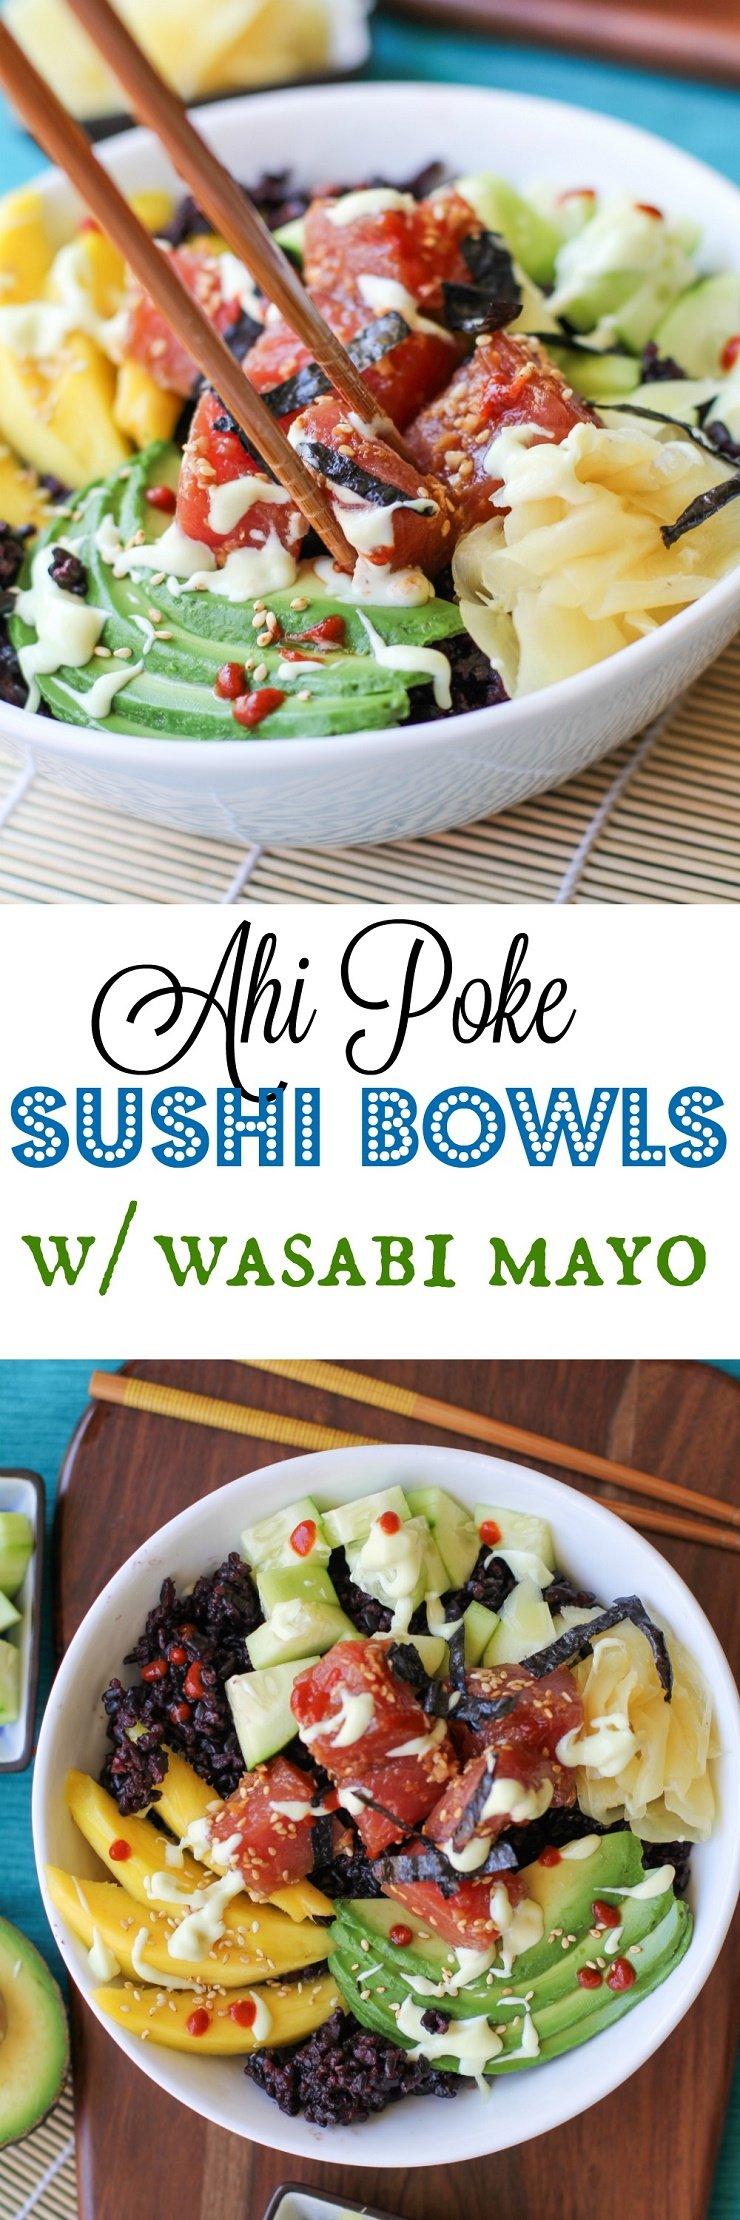 Ahi Poke Sushi Bowls with Wasabi Mayo   TheRoastedRoot.net #healthy #dinner #recipe #glutenfree